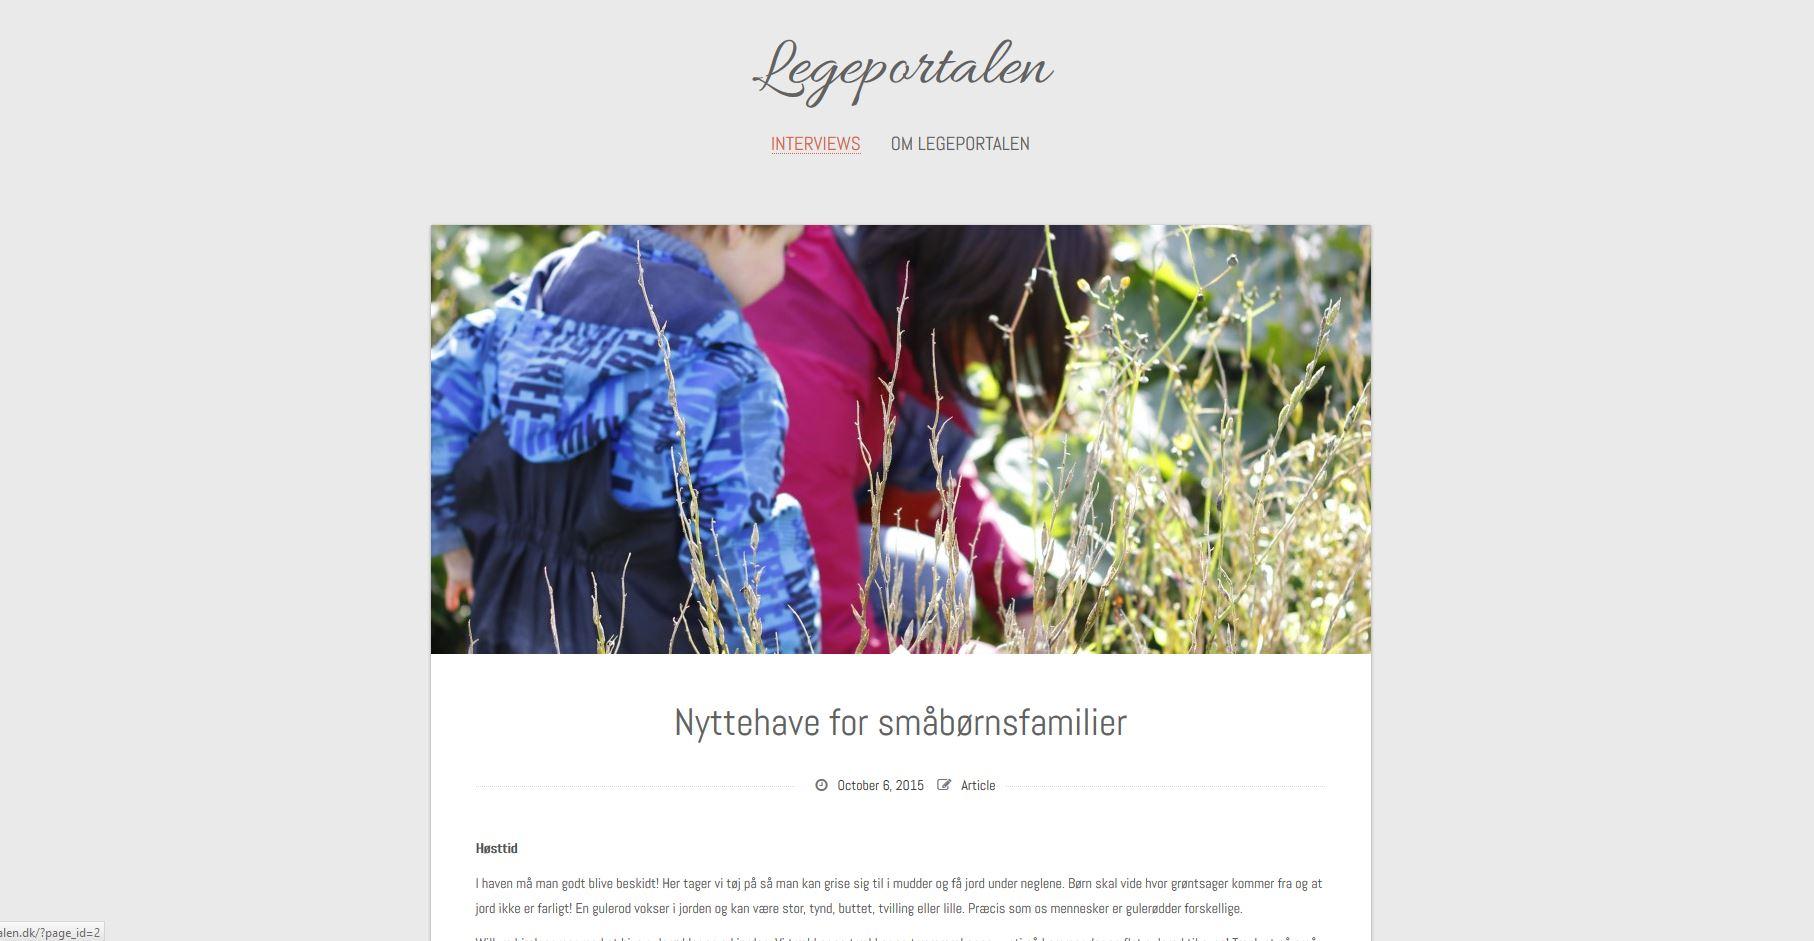 Legeportalen.dk